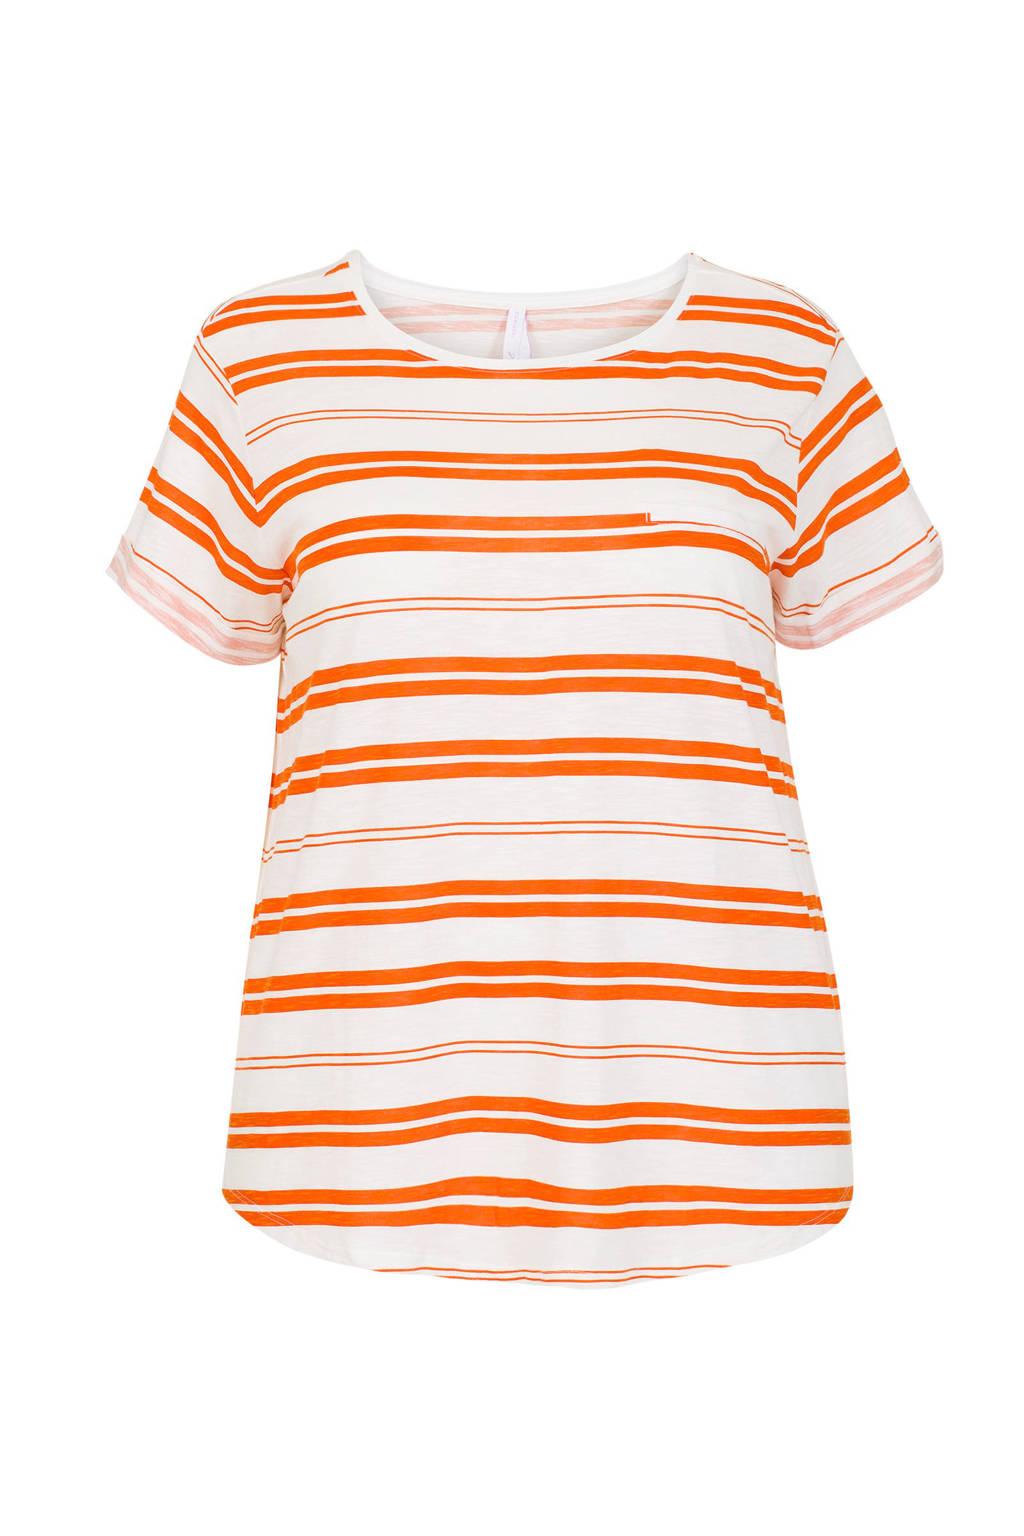 Miss Etam Plus gestreept T-shirt met borstzakje, Oranje/wit